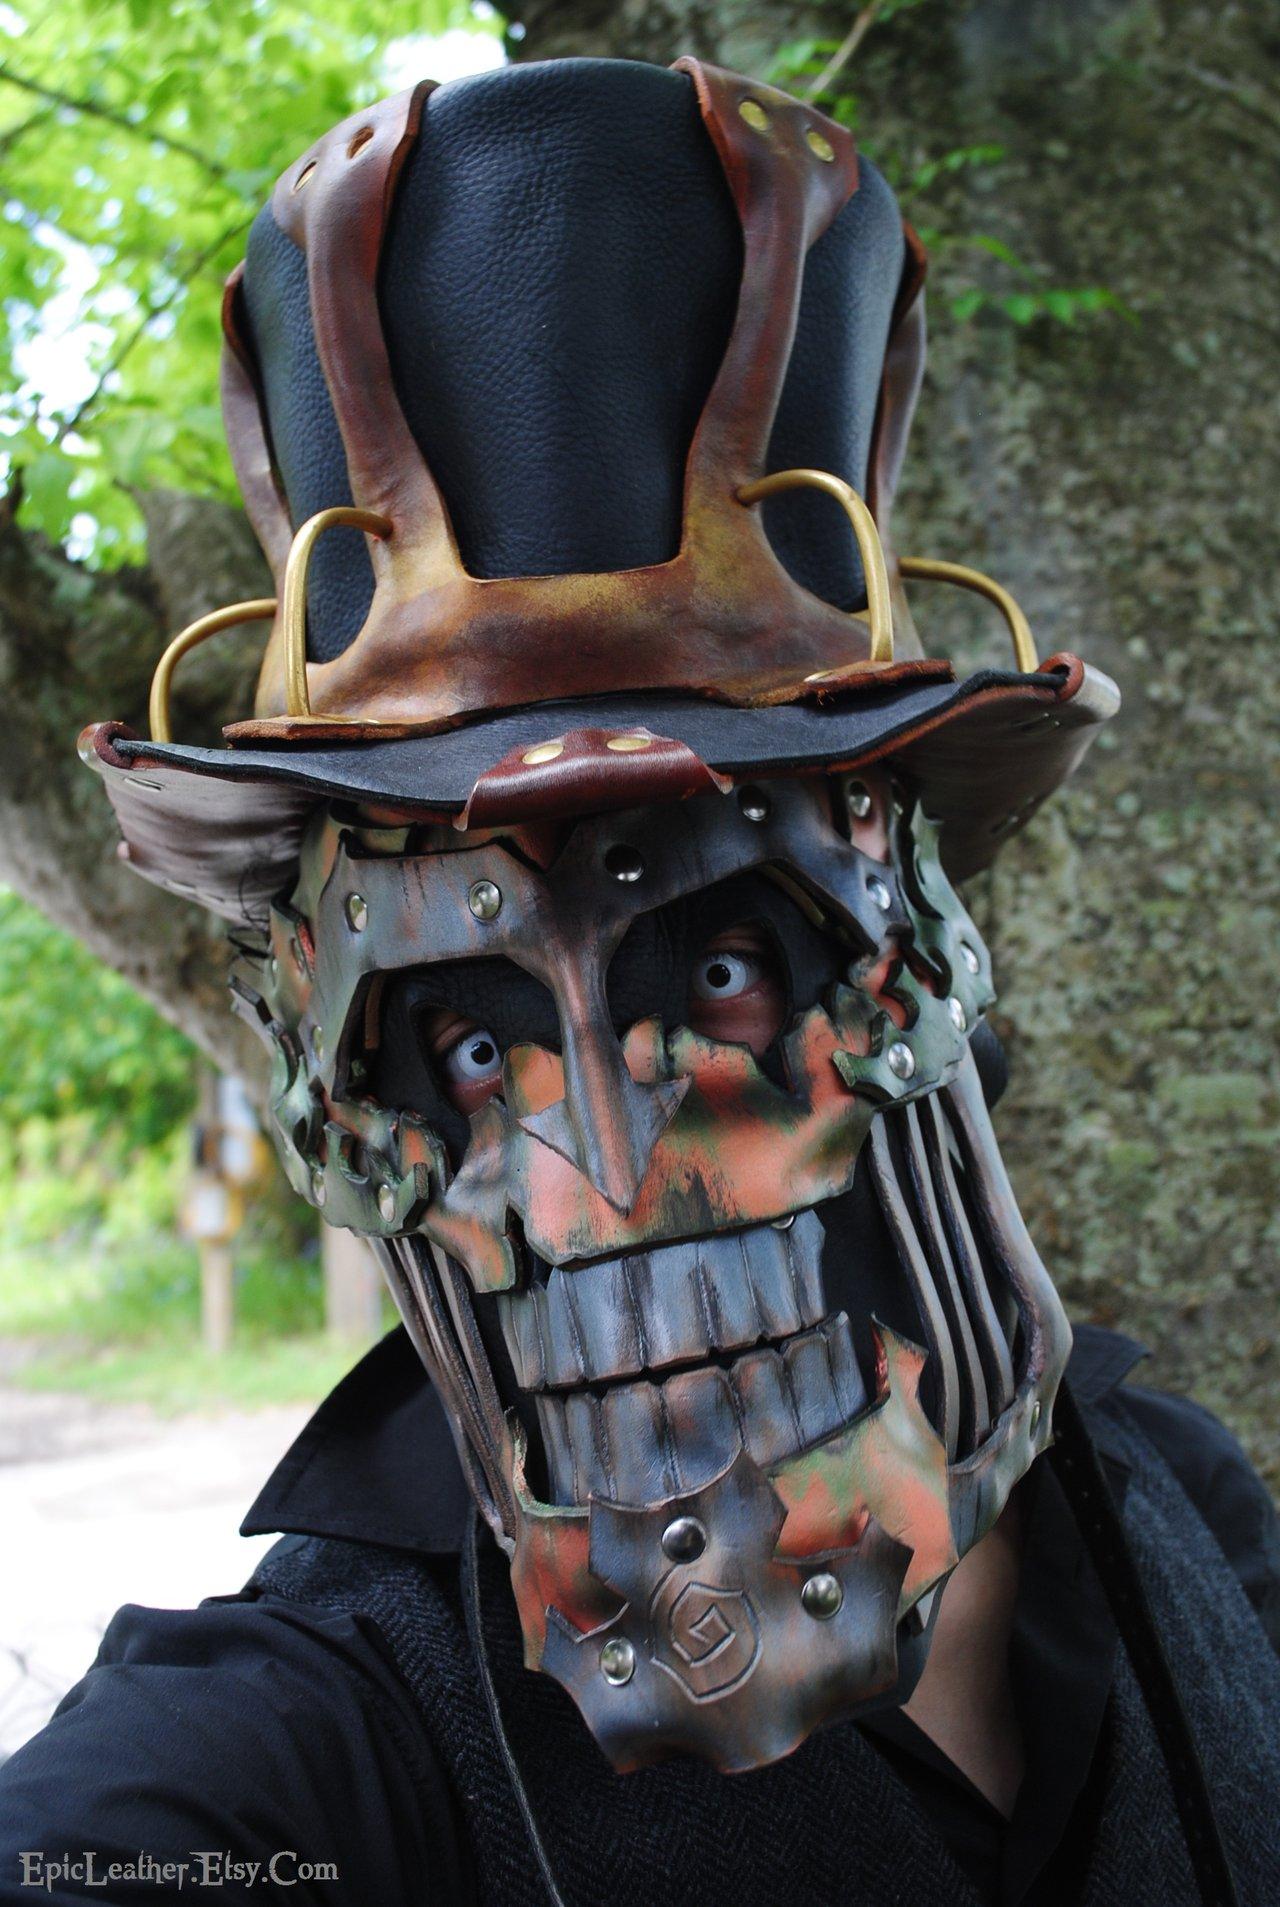 steampunk_metal_man_by_epic_leather-d6257lj.jpg